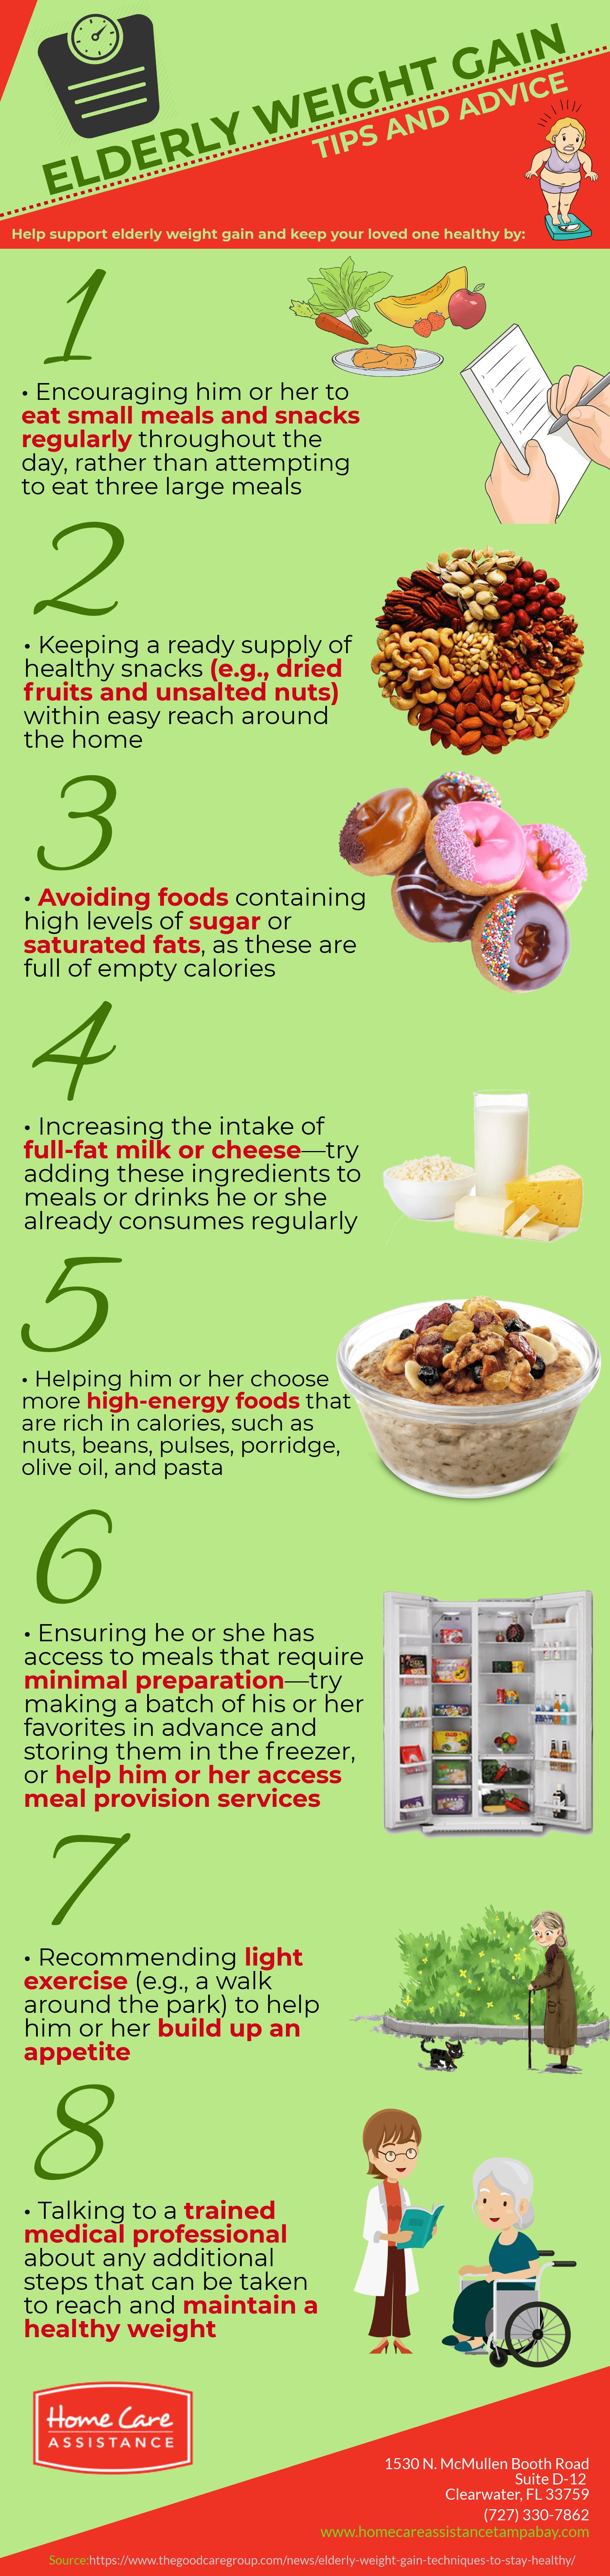 weight-gain-tips-for-elderly